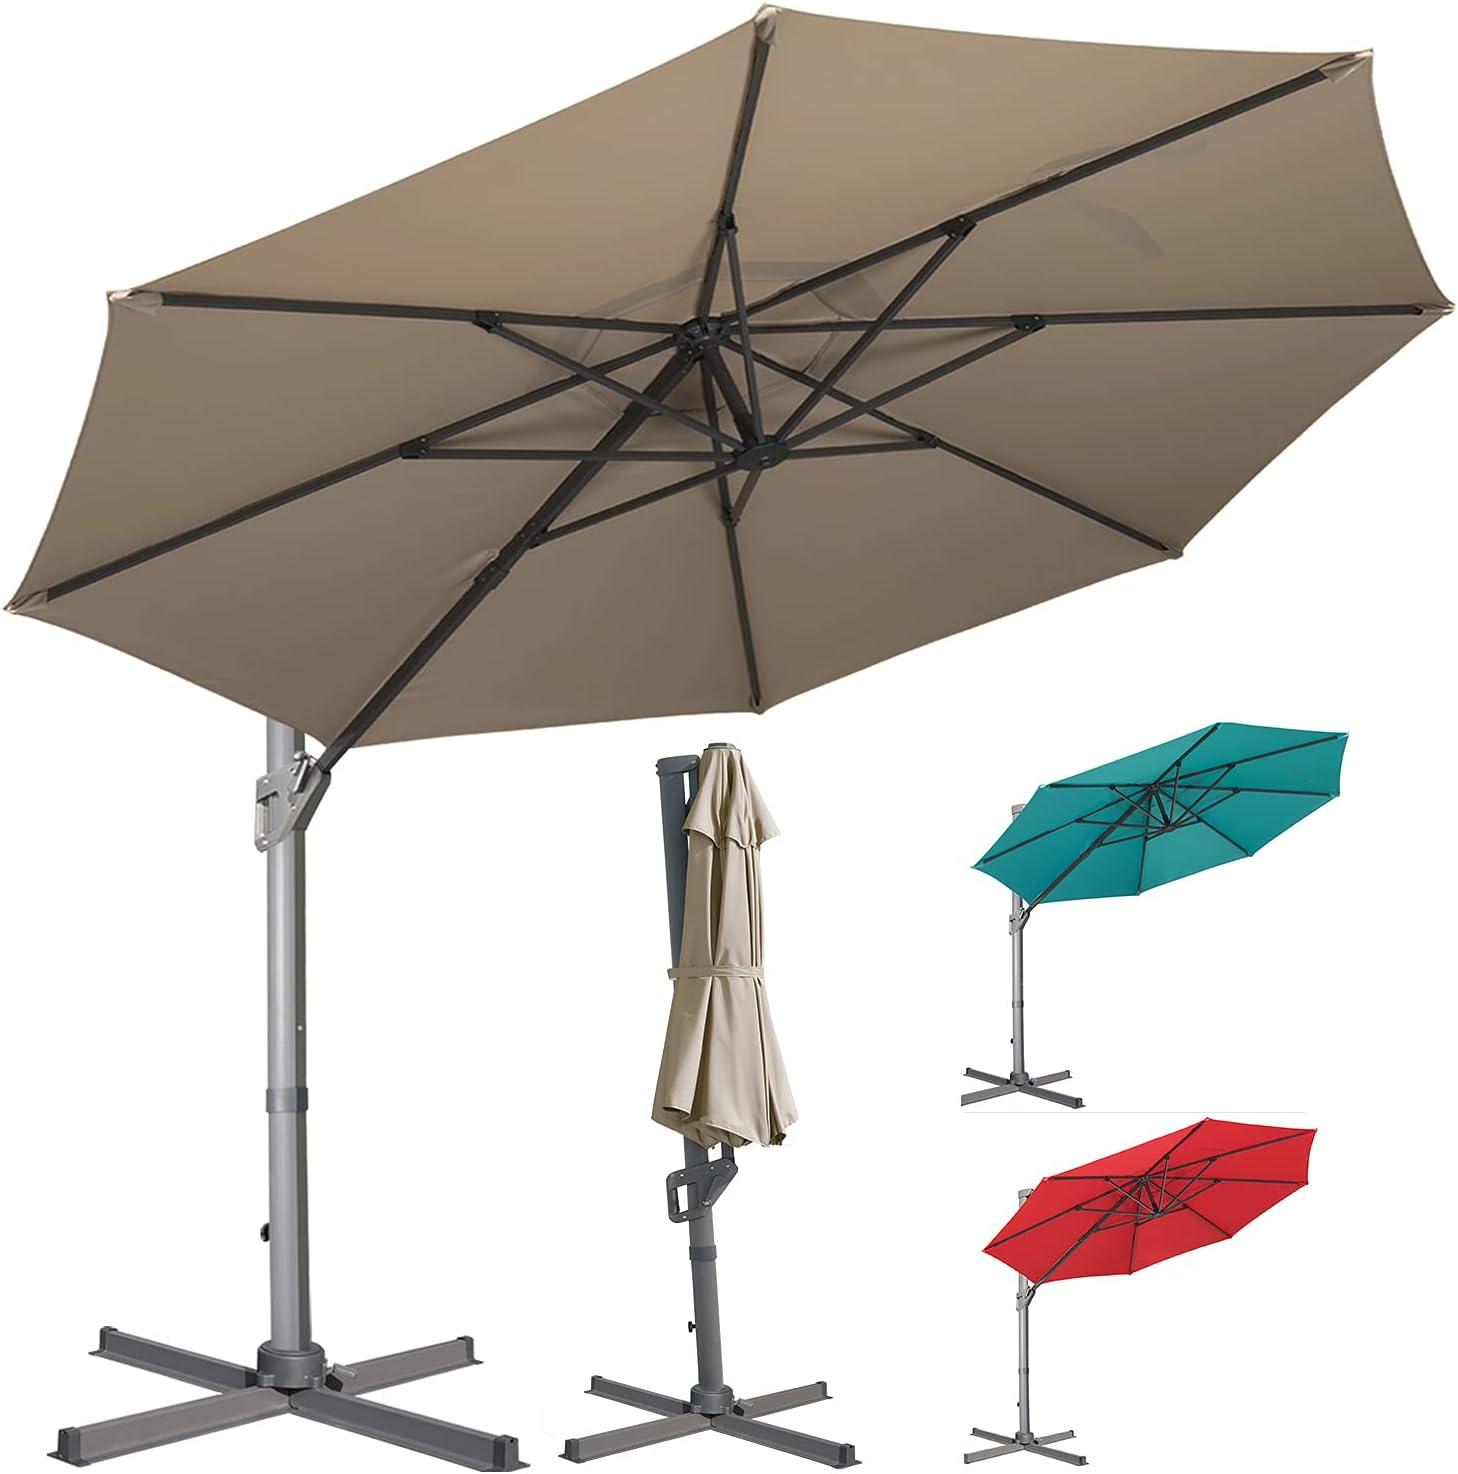 LKINBO 11FT Free Shipping Cheap Bargain Gift Offset Cantilever Patio Aluminum Outdoor Ha Umbrella Tulsa Mall